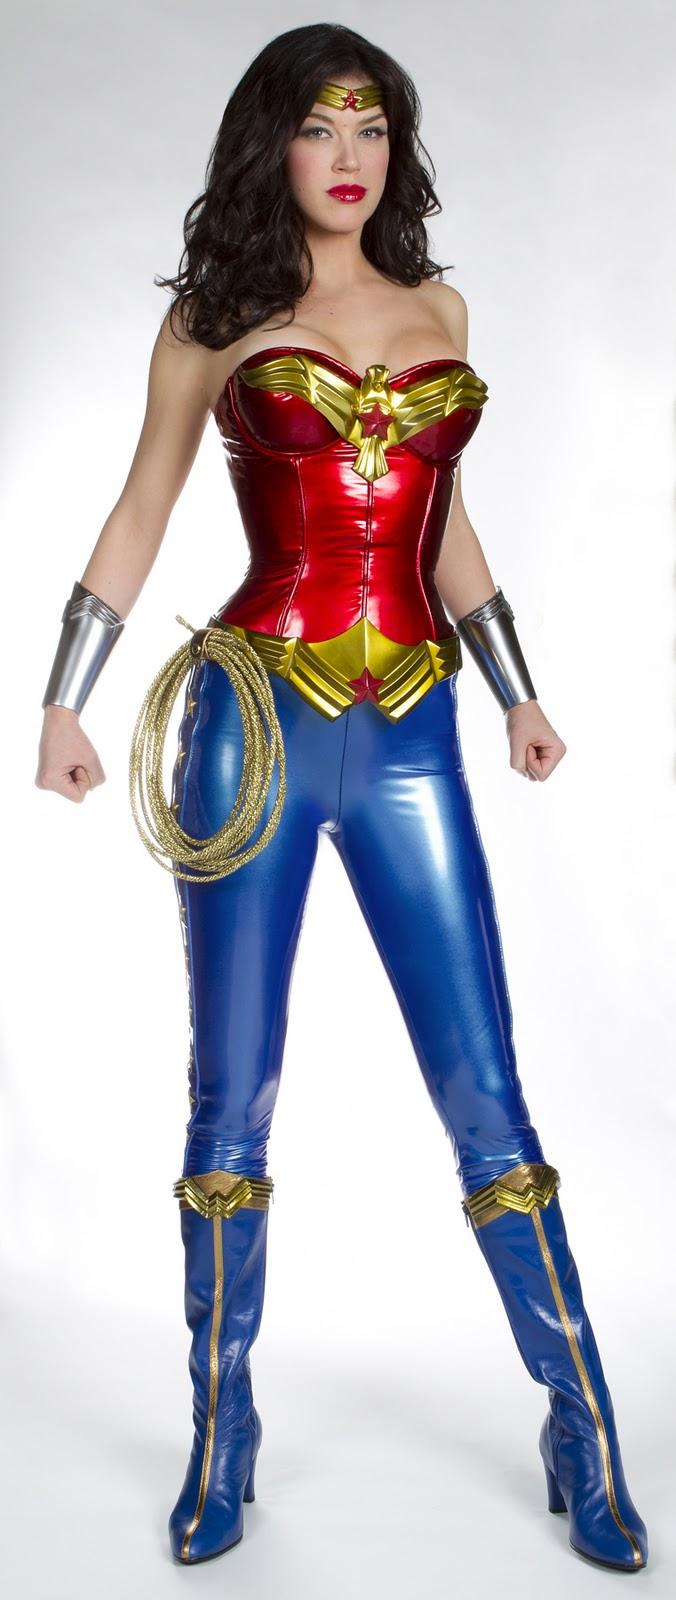 Leotard wonder woman costume-8281